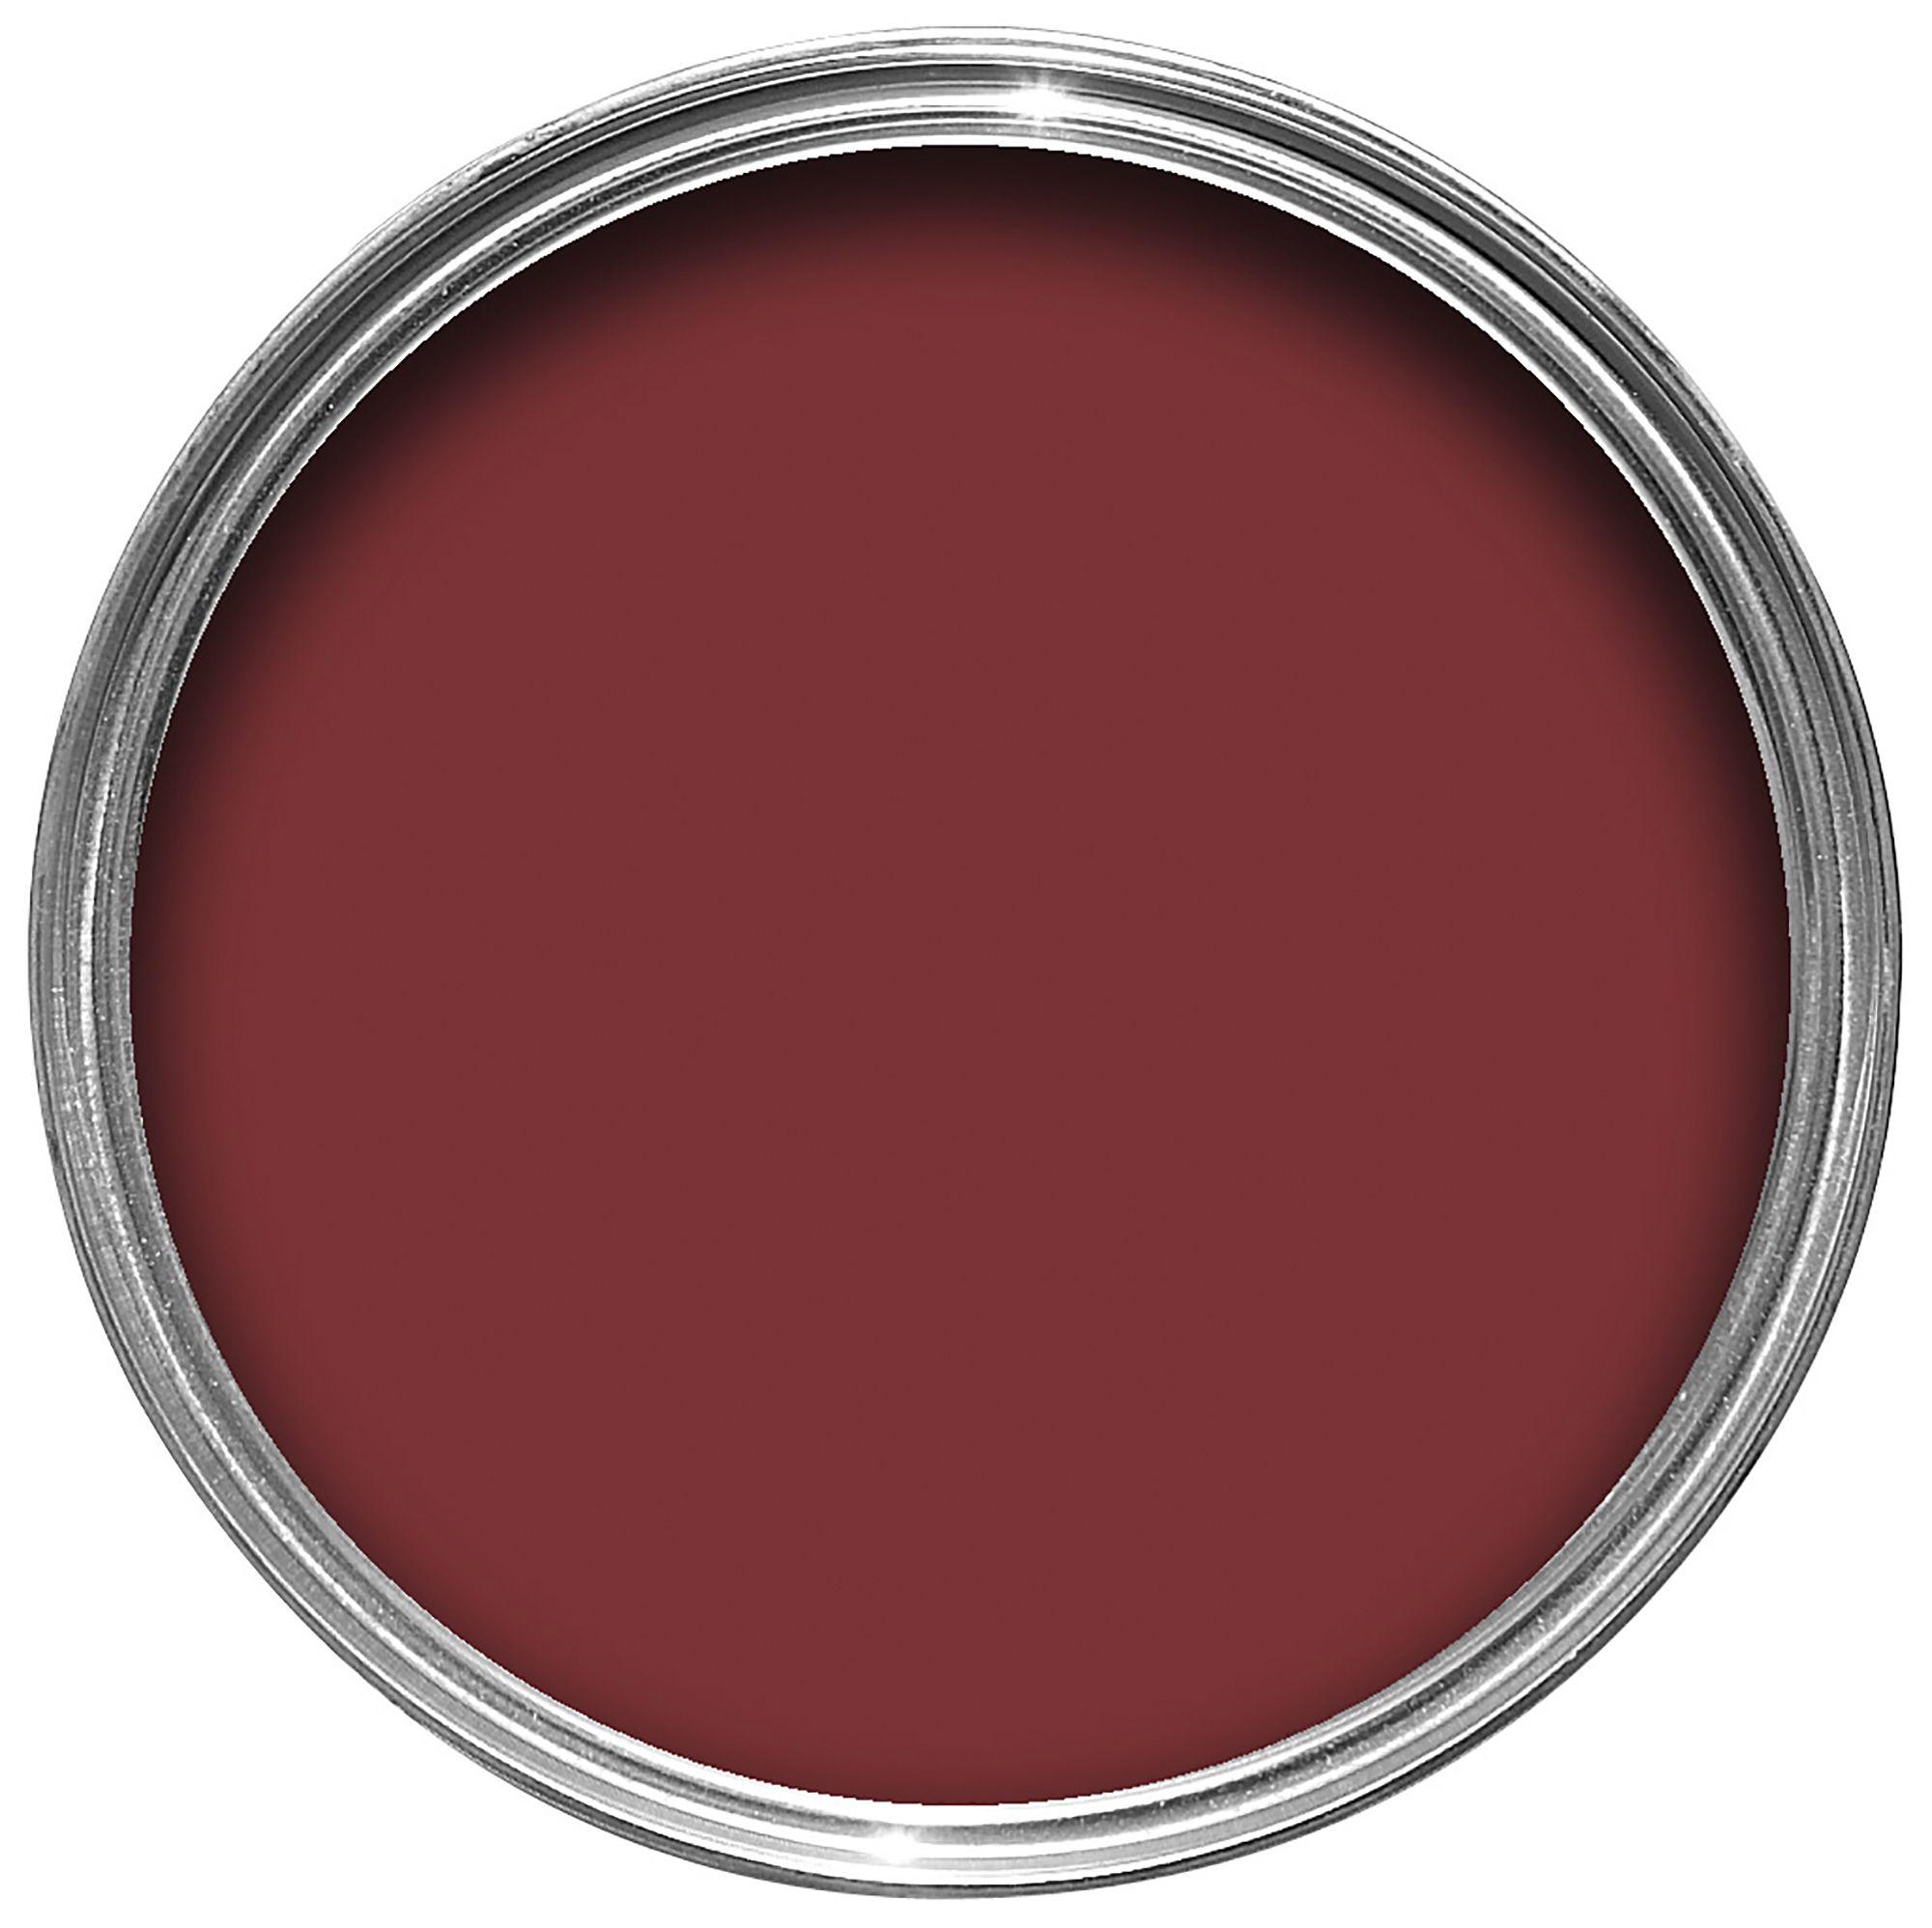 Colours Standard Clic Red Matt Emulsion Paint 2 5l Departments